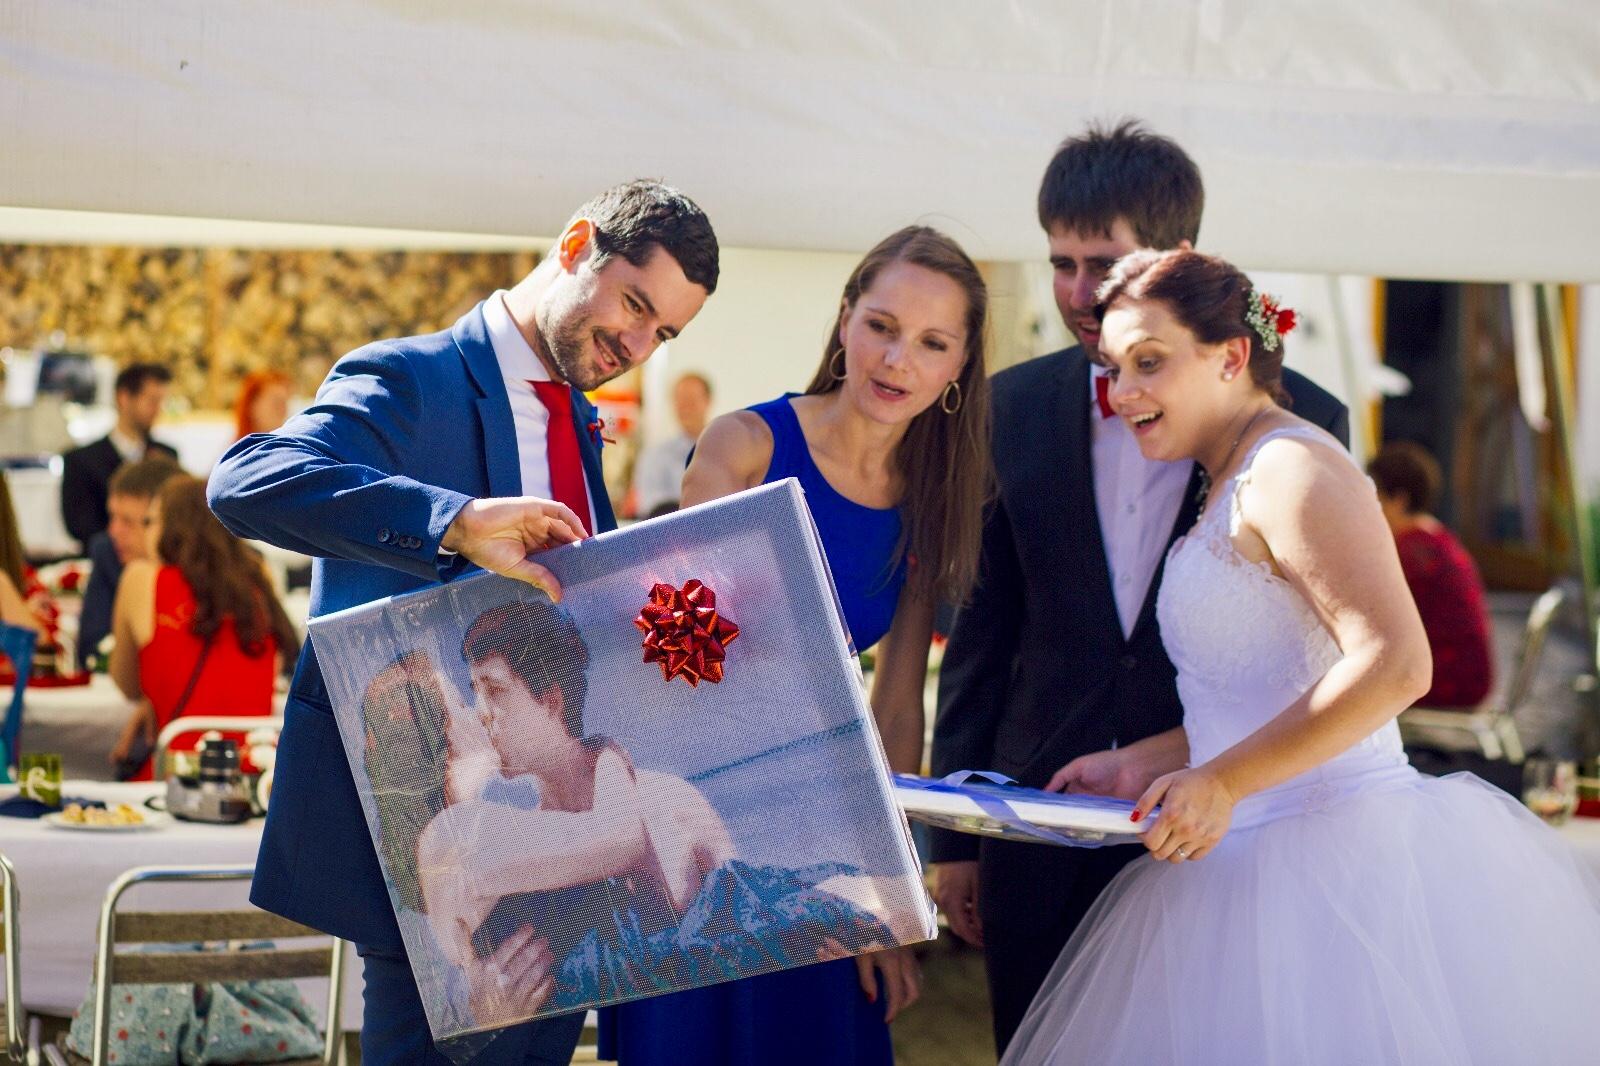 Darujte ke svatbě obraz podle fotky!